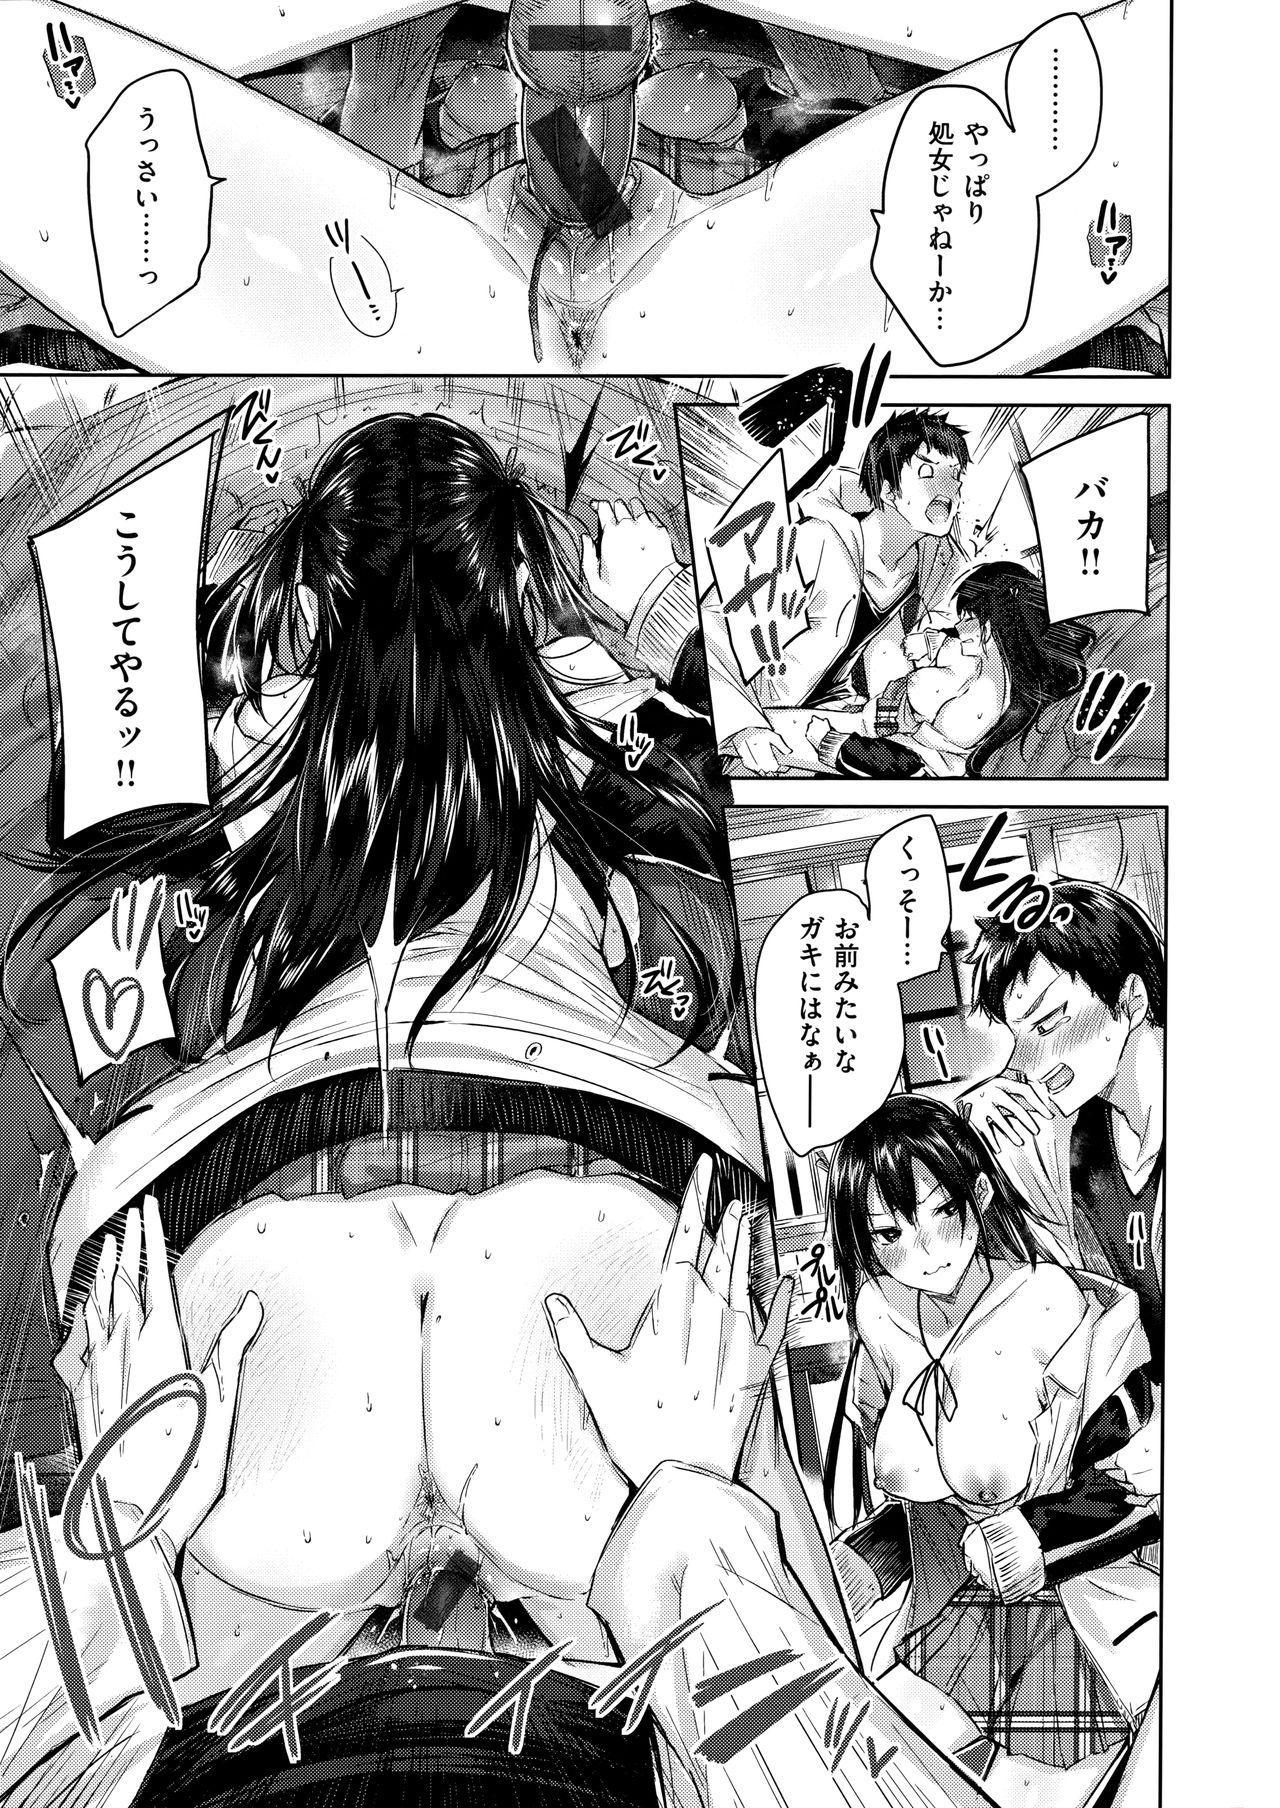 Nakadashi Strike! - Winning strike! 190